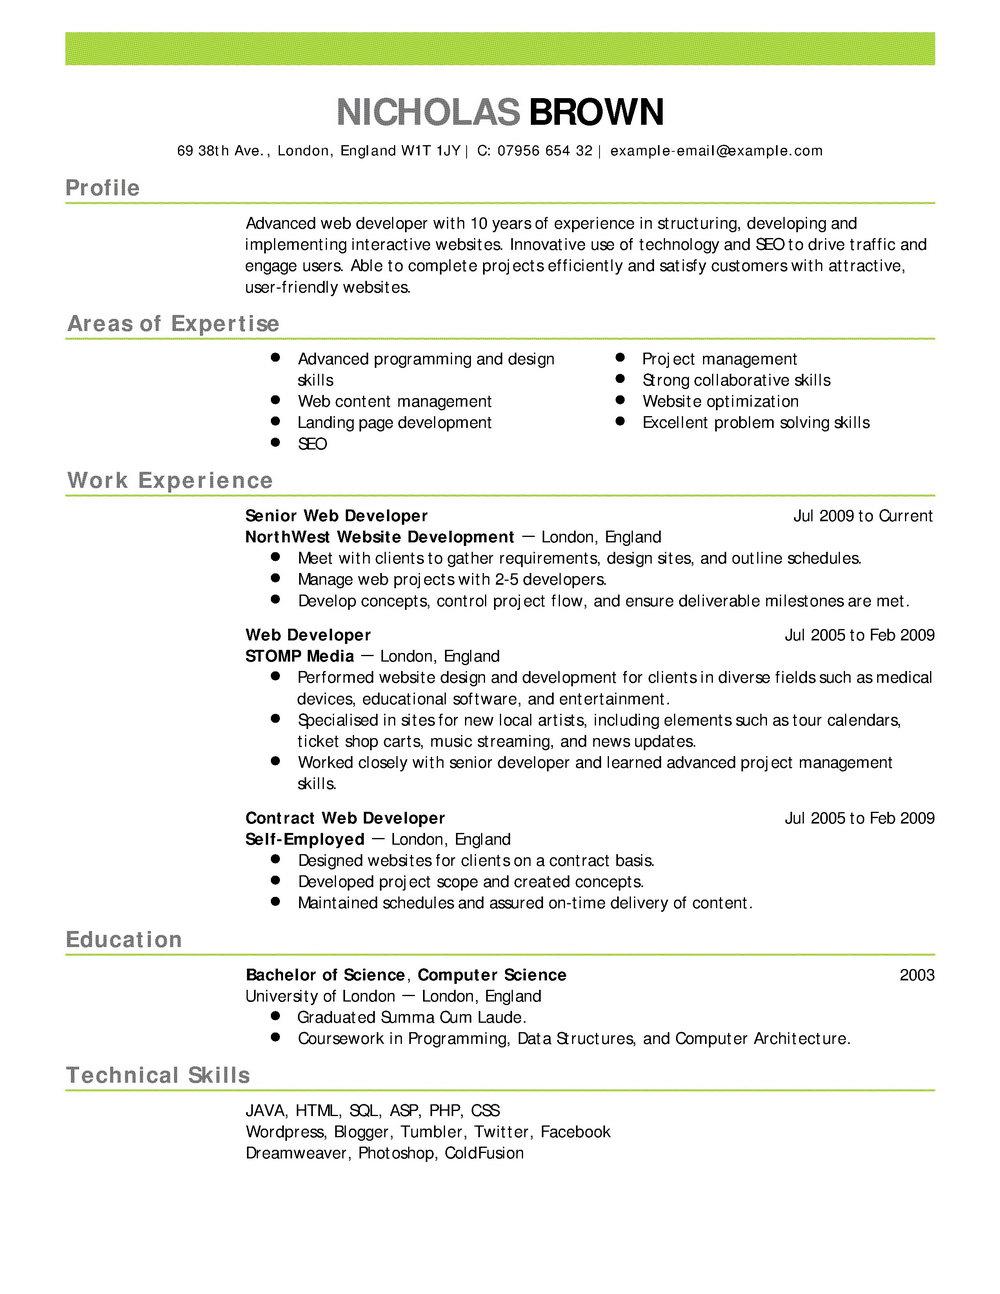 Free Online Resume Builder Australia